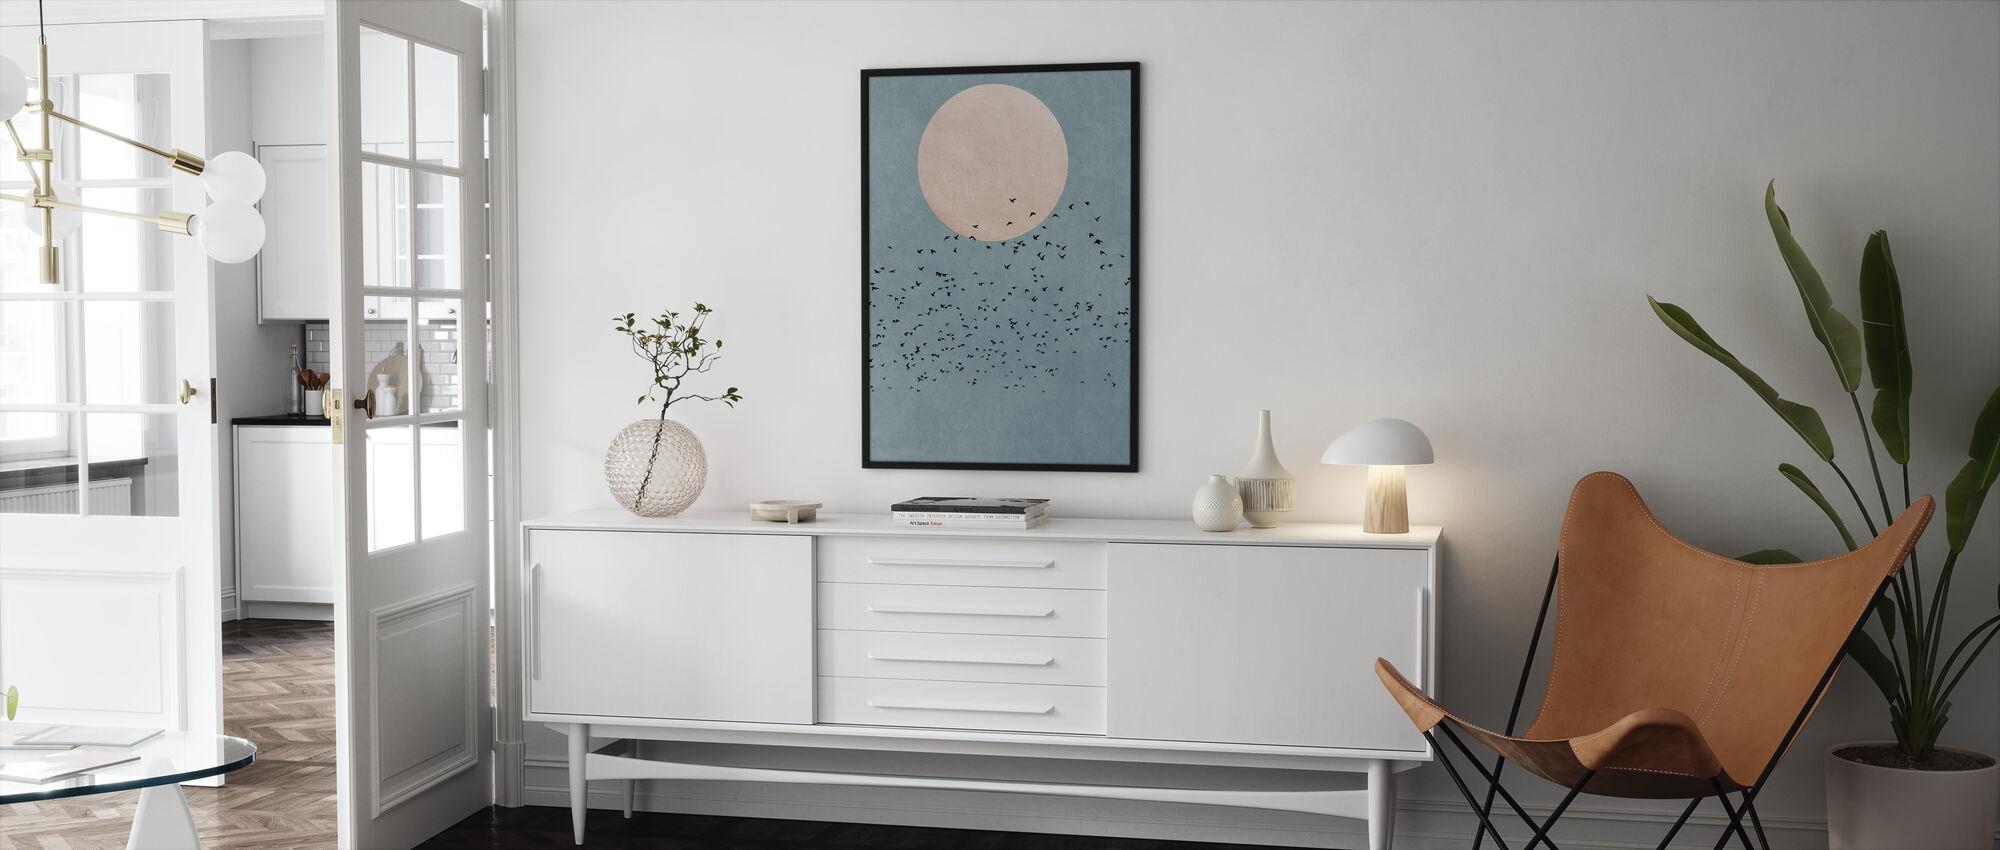 Vliegen weg - Ingelijste print - Woonkamer